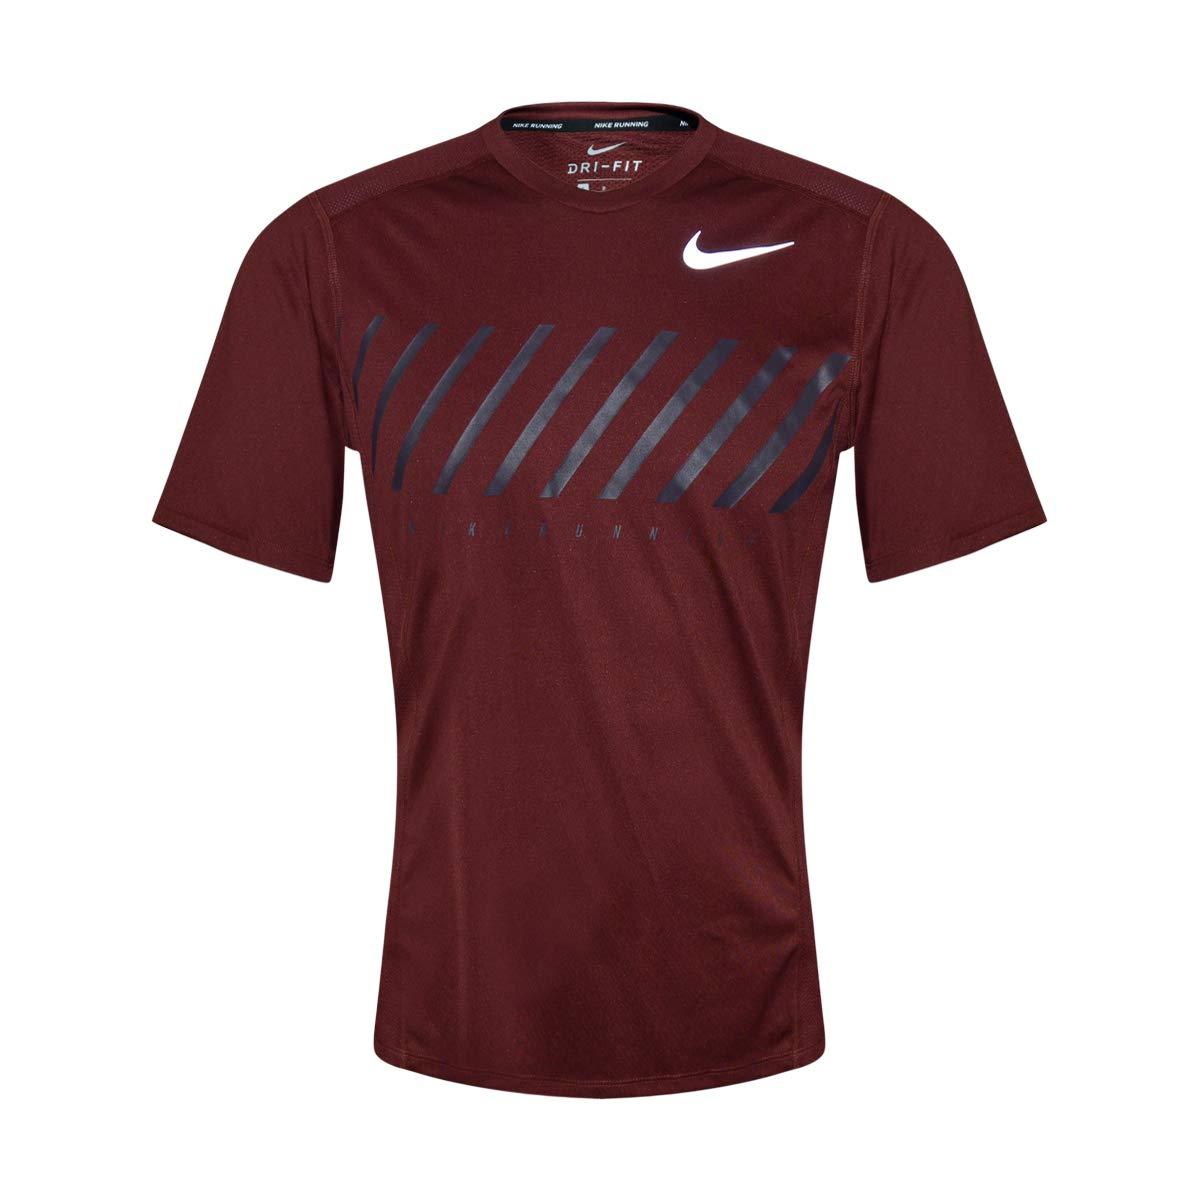 Nike Men's Dri-Fit Short Sleeve Running Top (Maroon, Small)